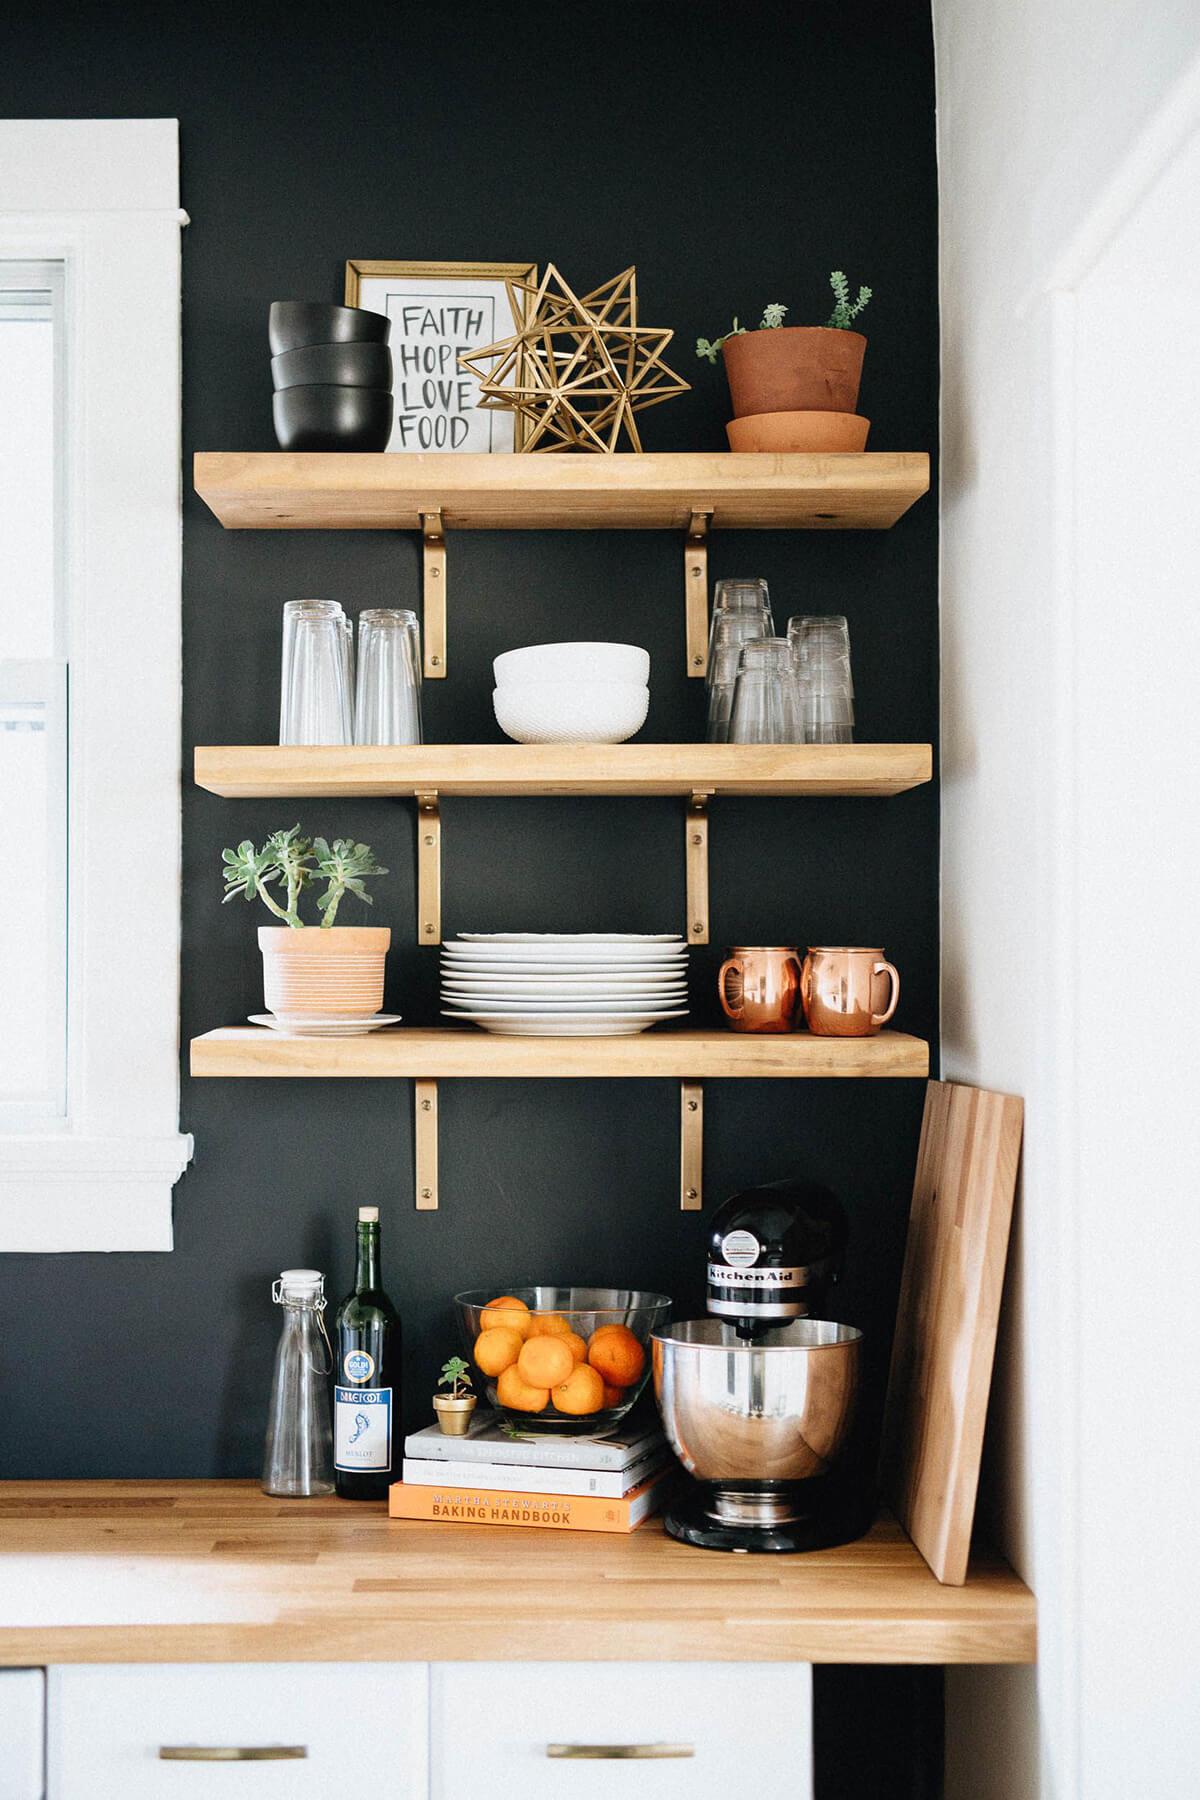 03-open-kitchen-shelf-ideas-homebnc